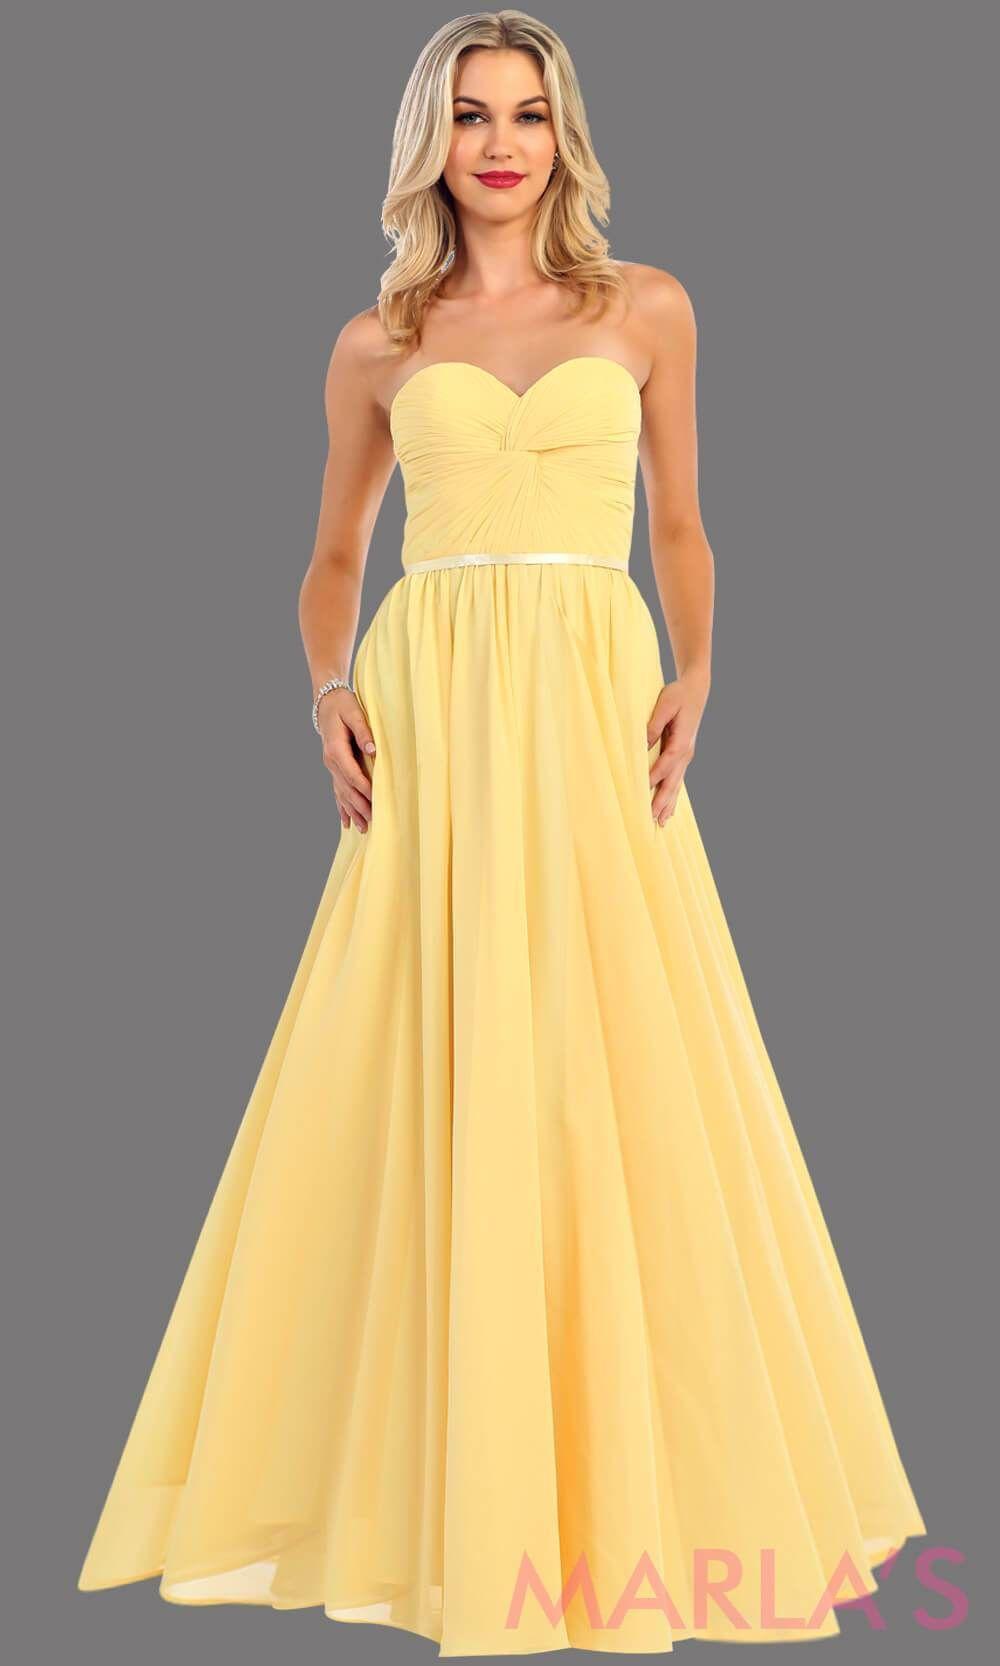 Cinderella Divine 7455 Long Dandy Dress Dresses Simple Prom Dress Grad Dresses Long [ 1666 x 1000 Pixel ]